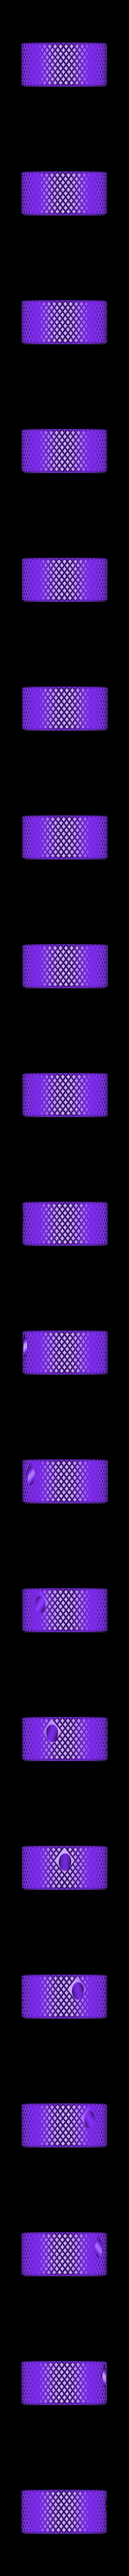 EDC-Container_Deckel_2.stl Download free STL file EDC-Container • 3D print model, Sparhawk